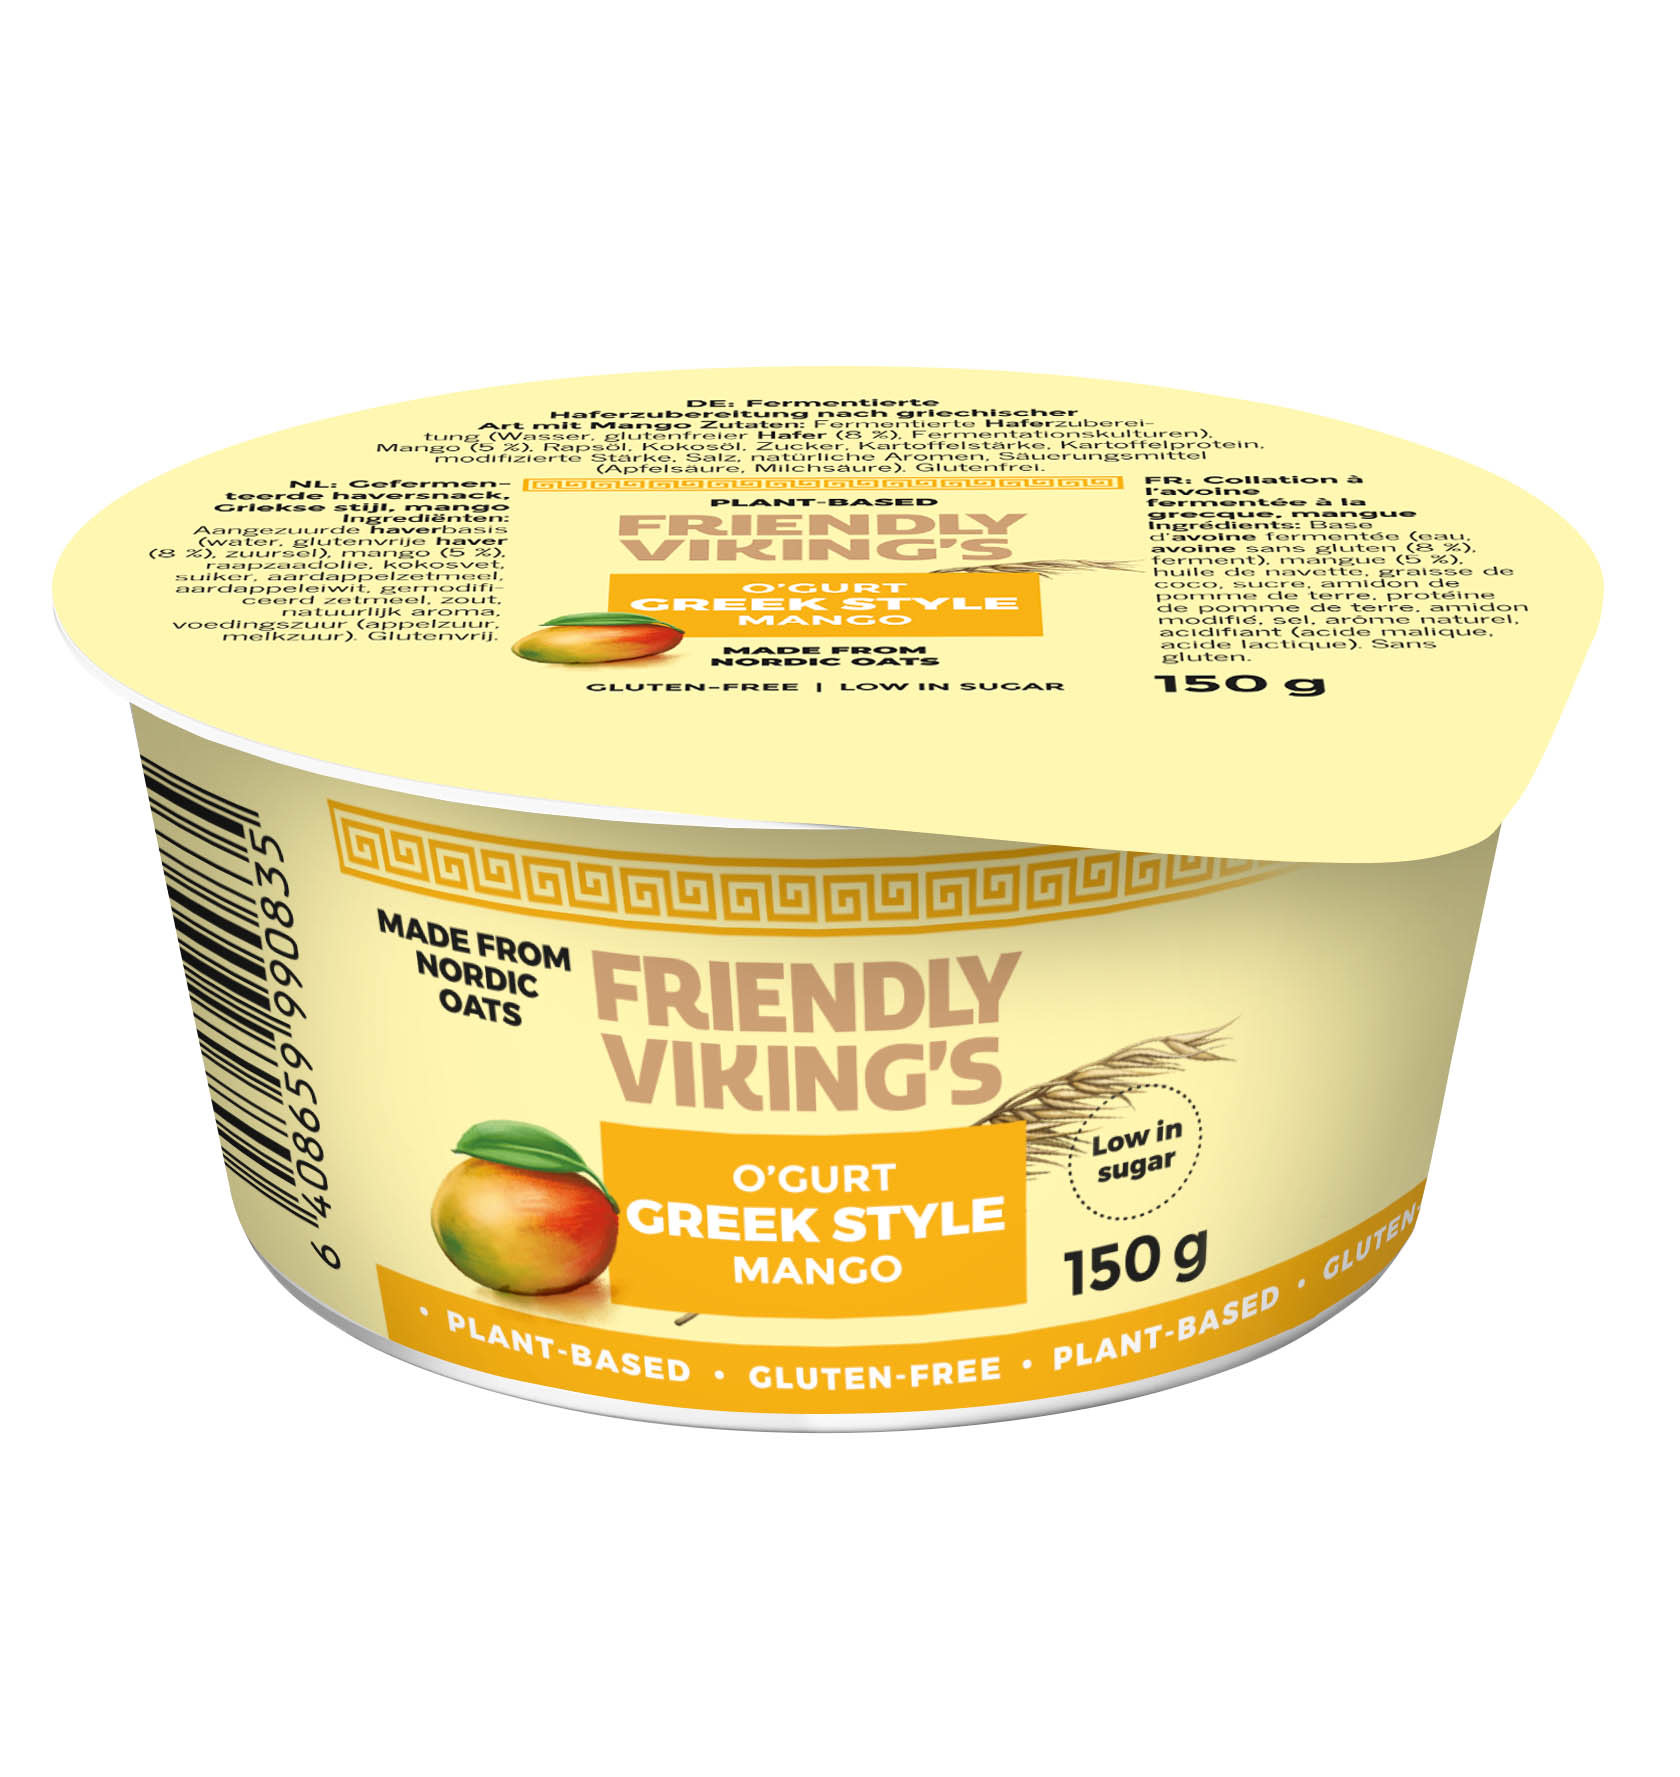 FRIENDLY VIKING'S FRIENDLY VIKING'S Greek Style Mango Yogert